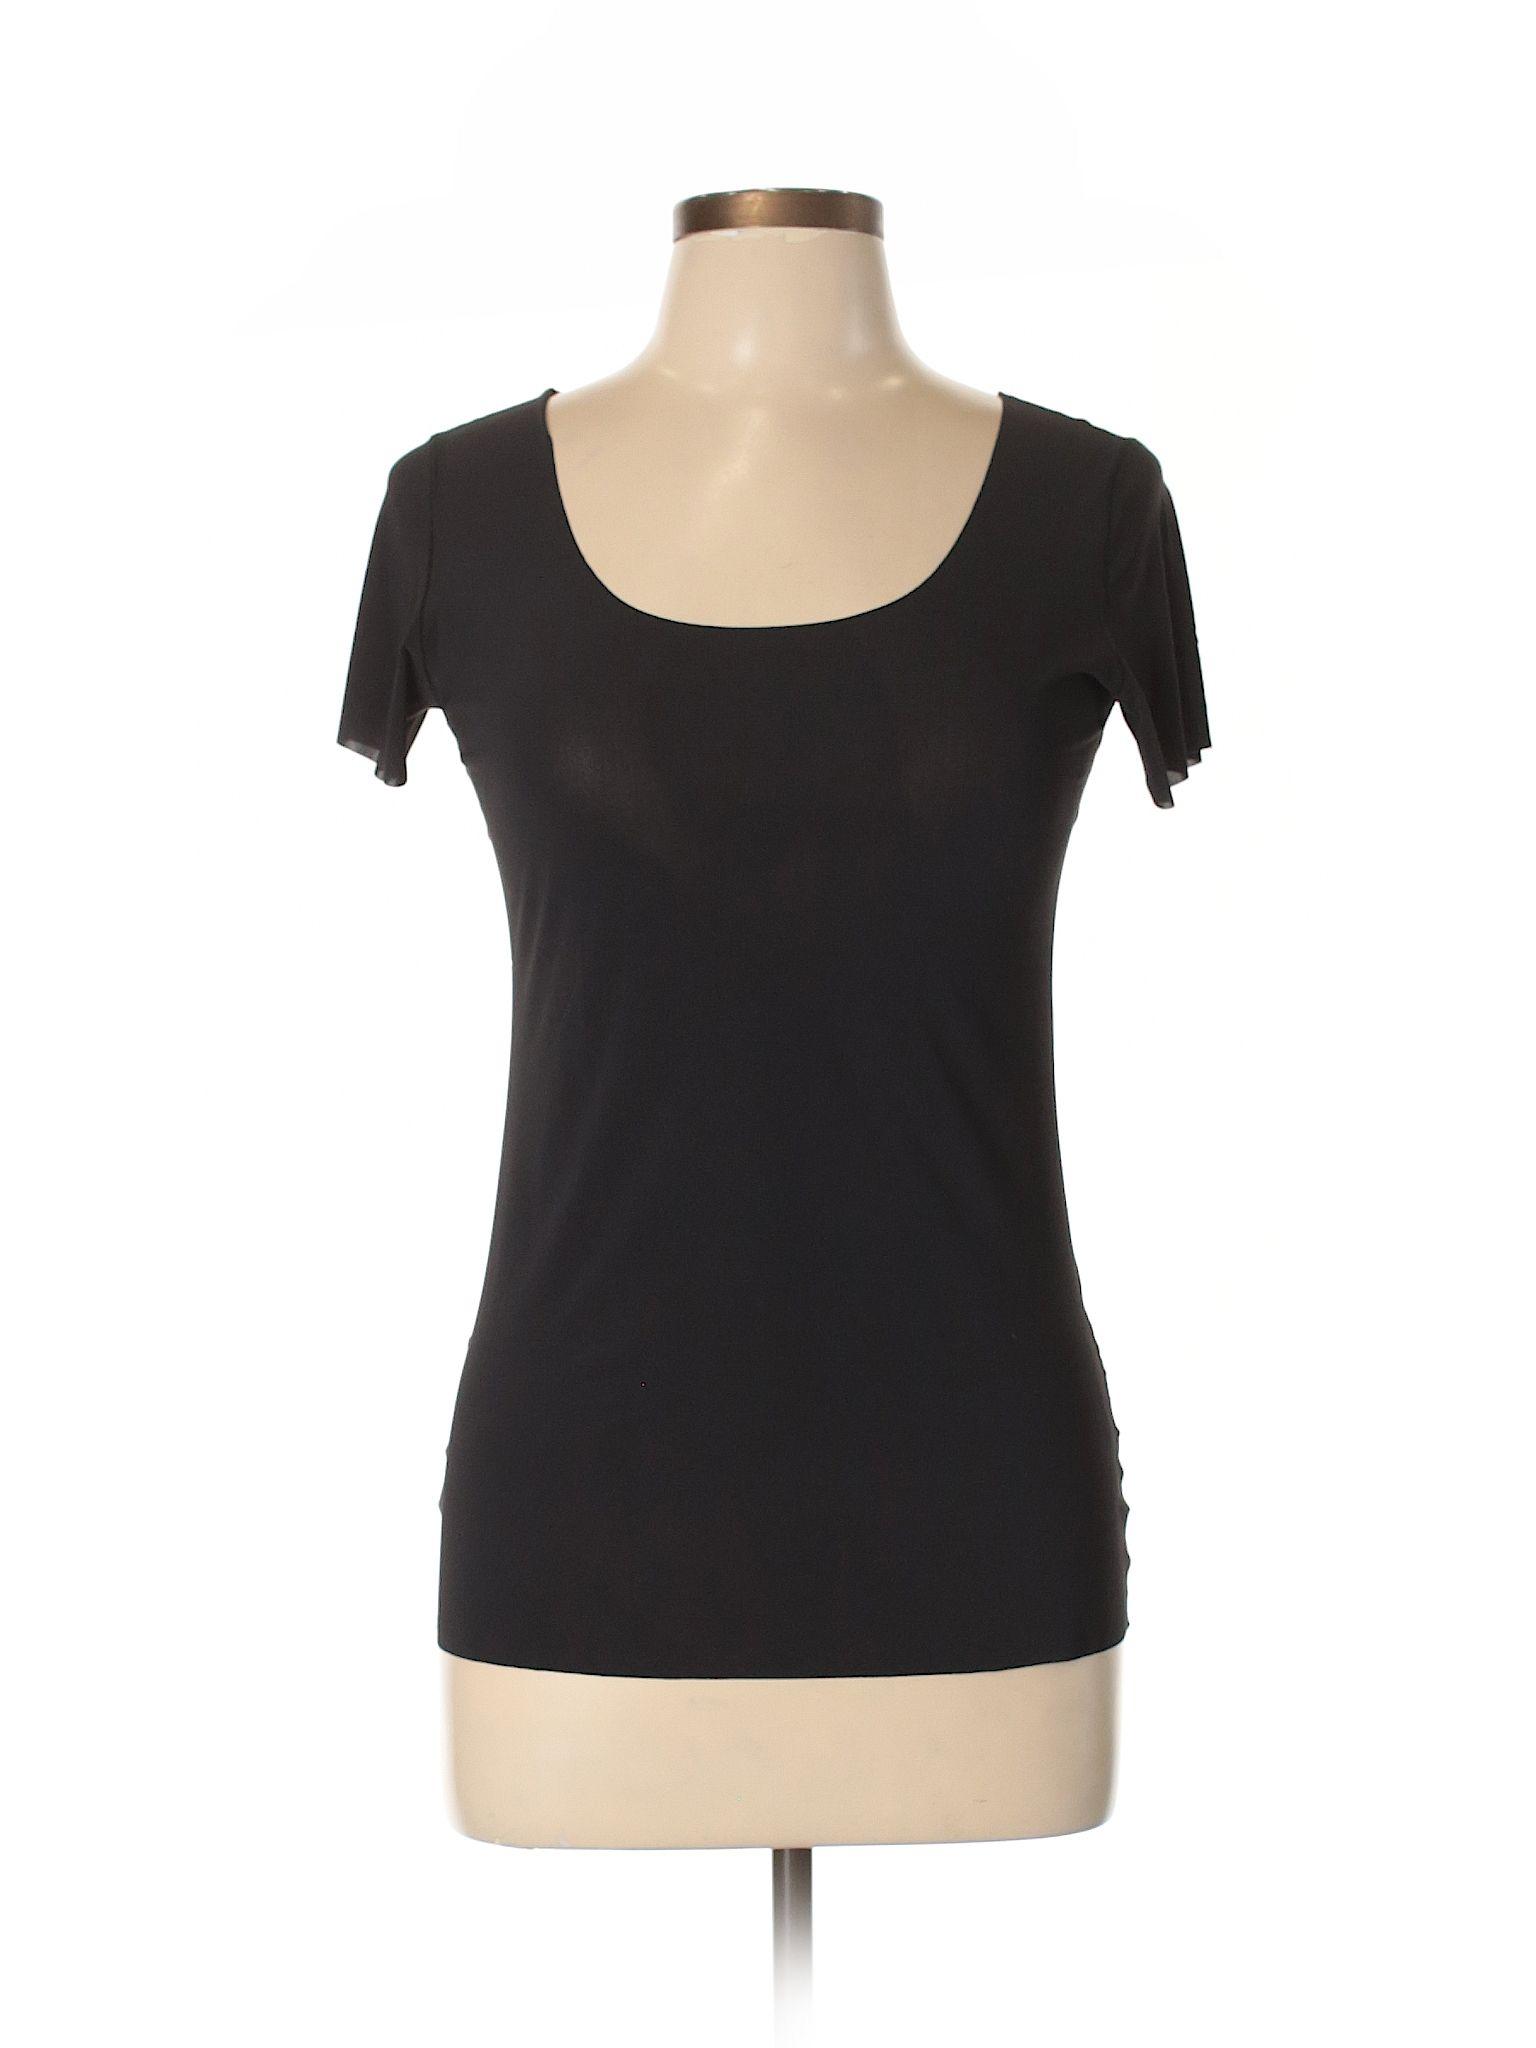 Uniqlo short sleeve top size black womenus tops